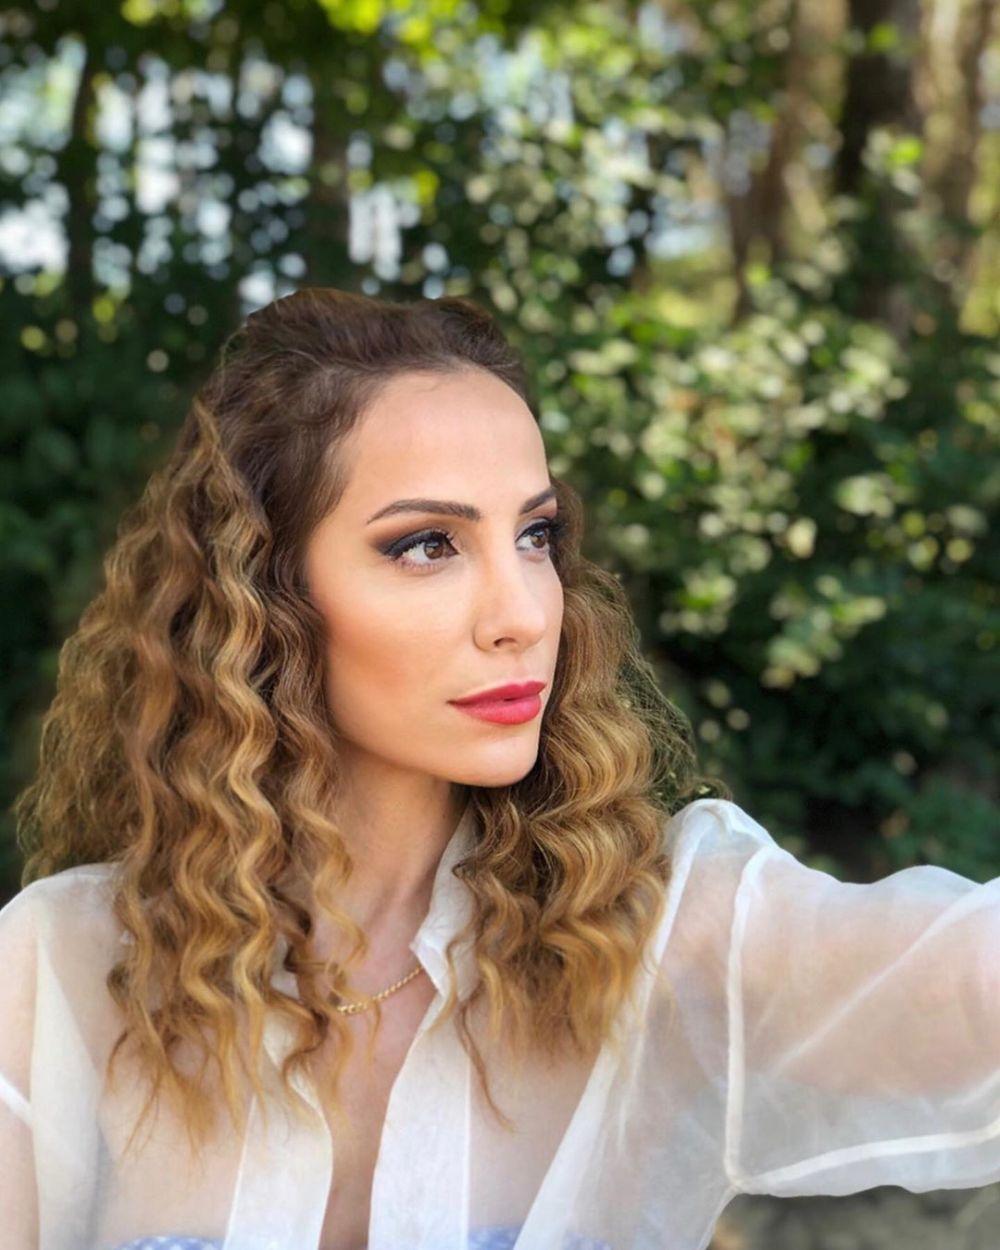 Kabar pemain drama Turki Cinta di Musim Cherry berbagai sumber